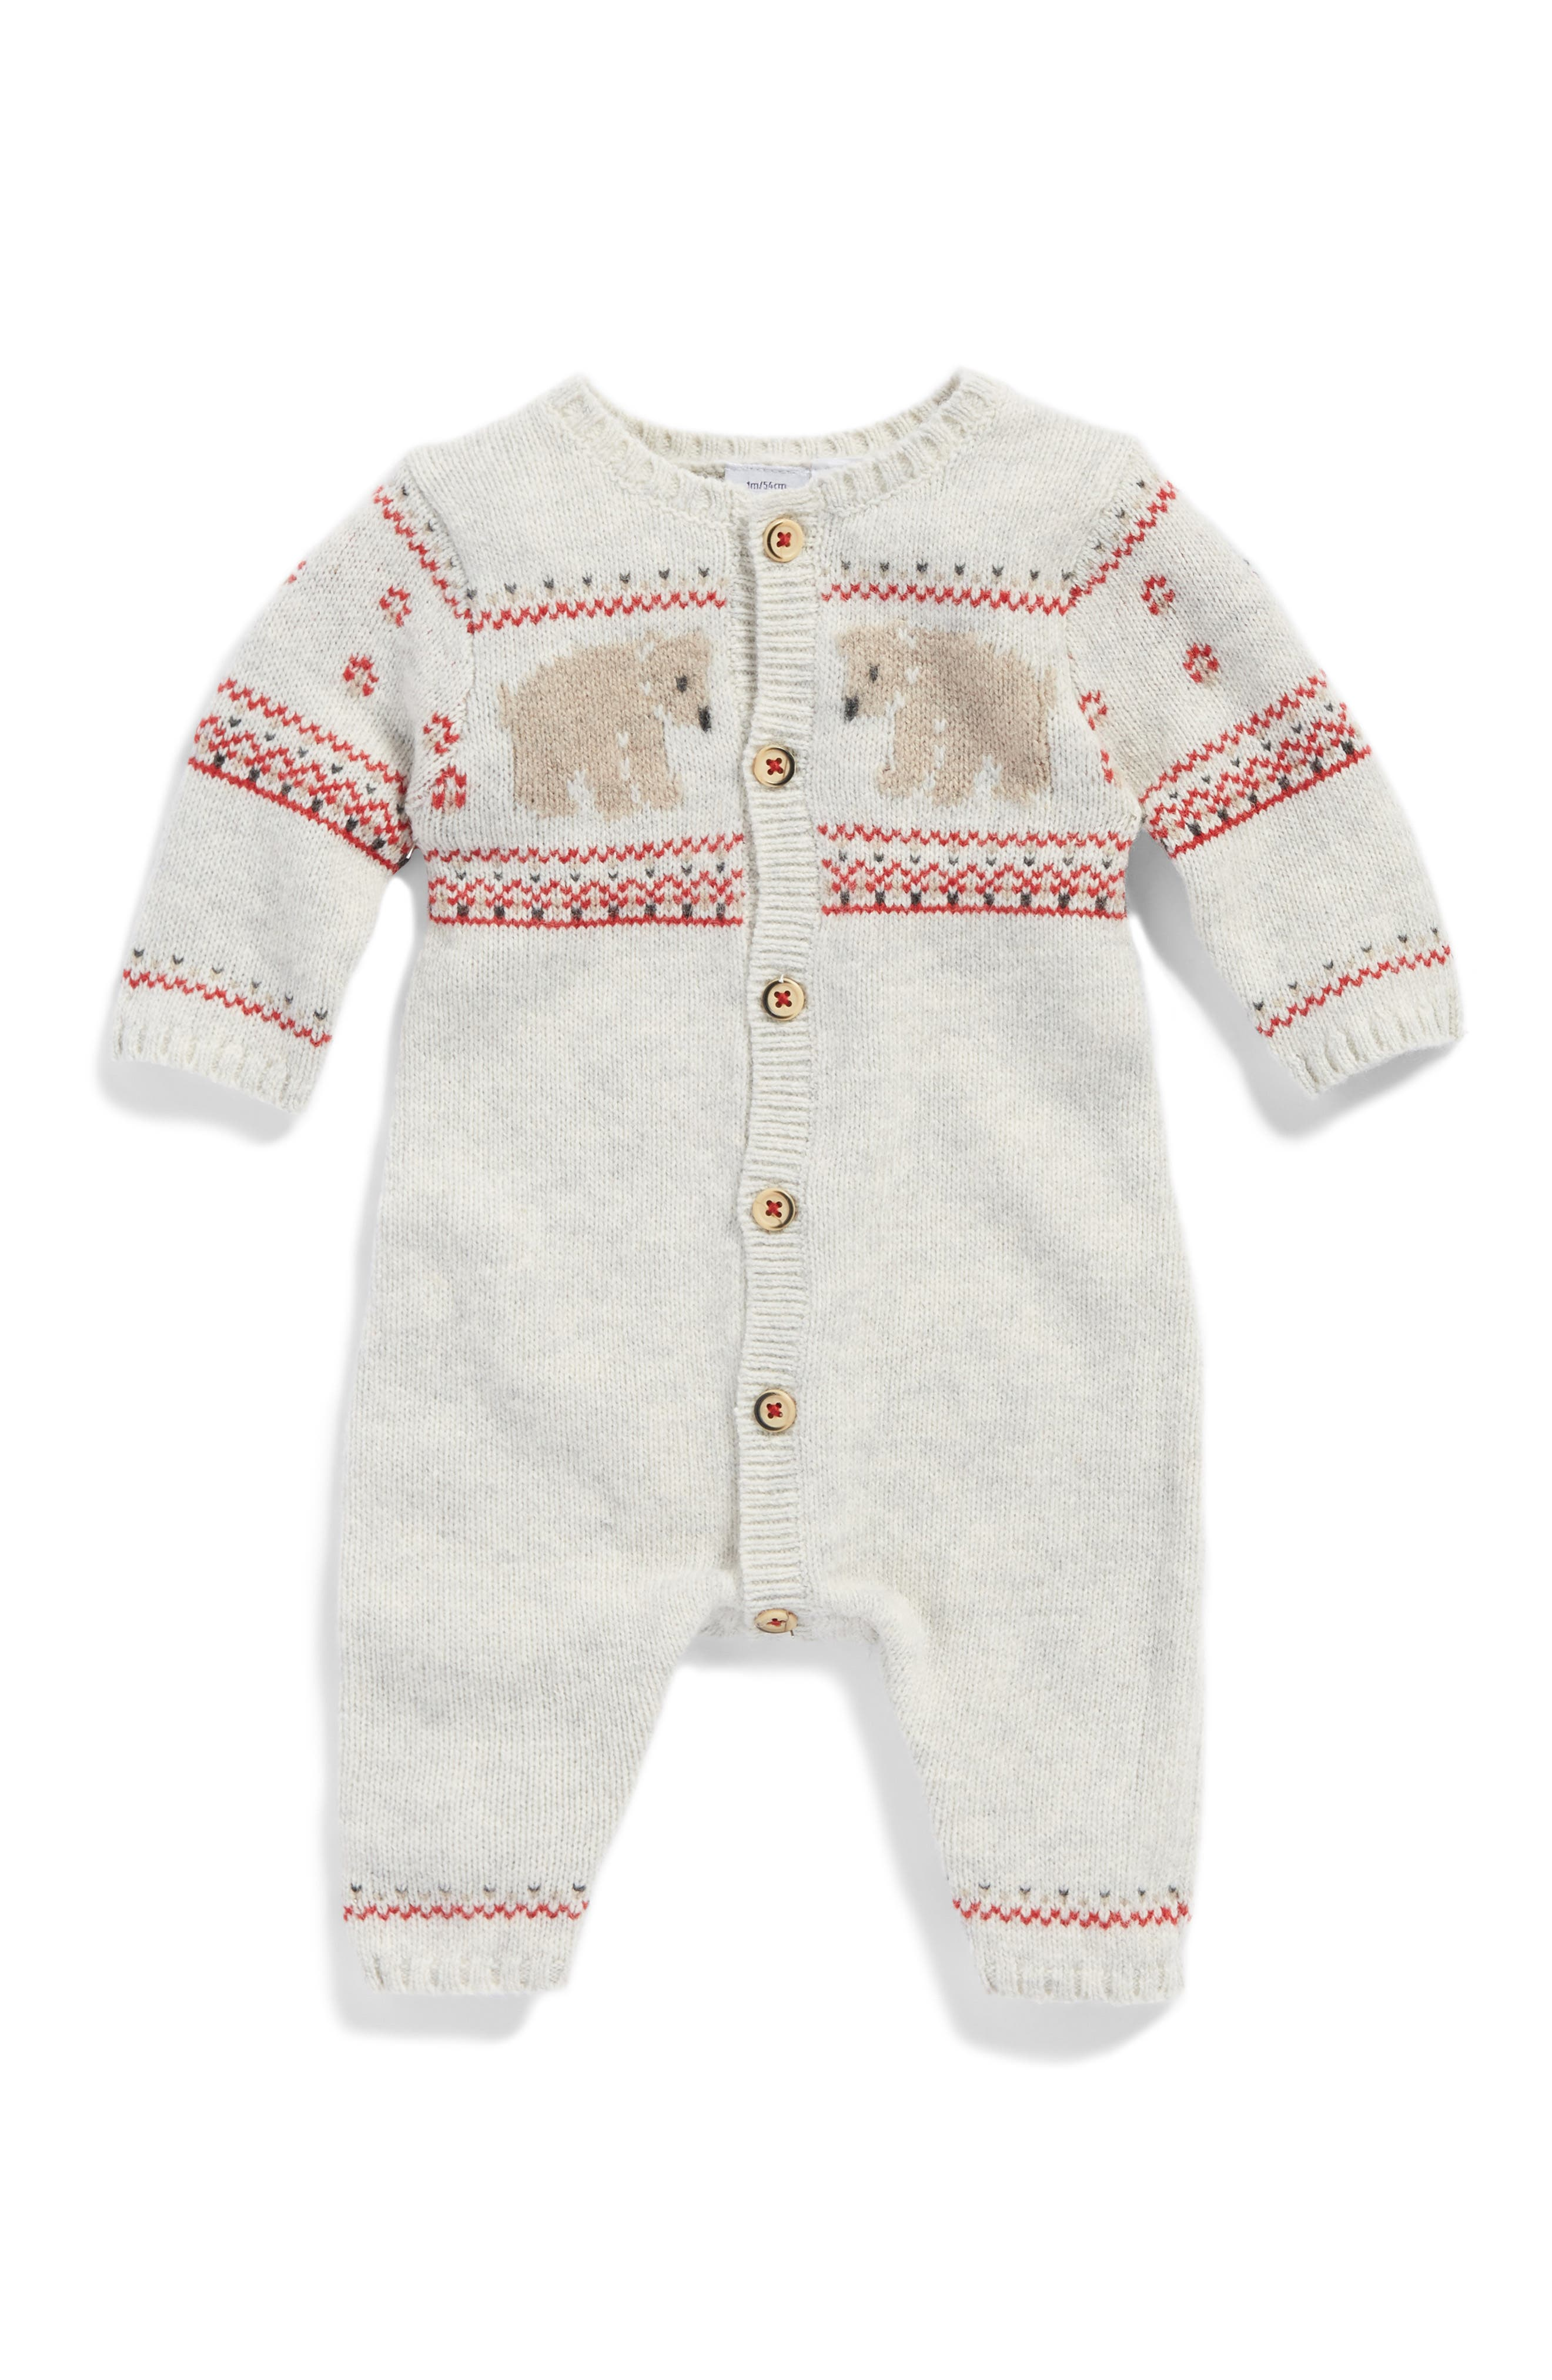 Main Image - Petit Bateau Jacquard Knit Romper (Baby)